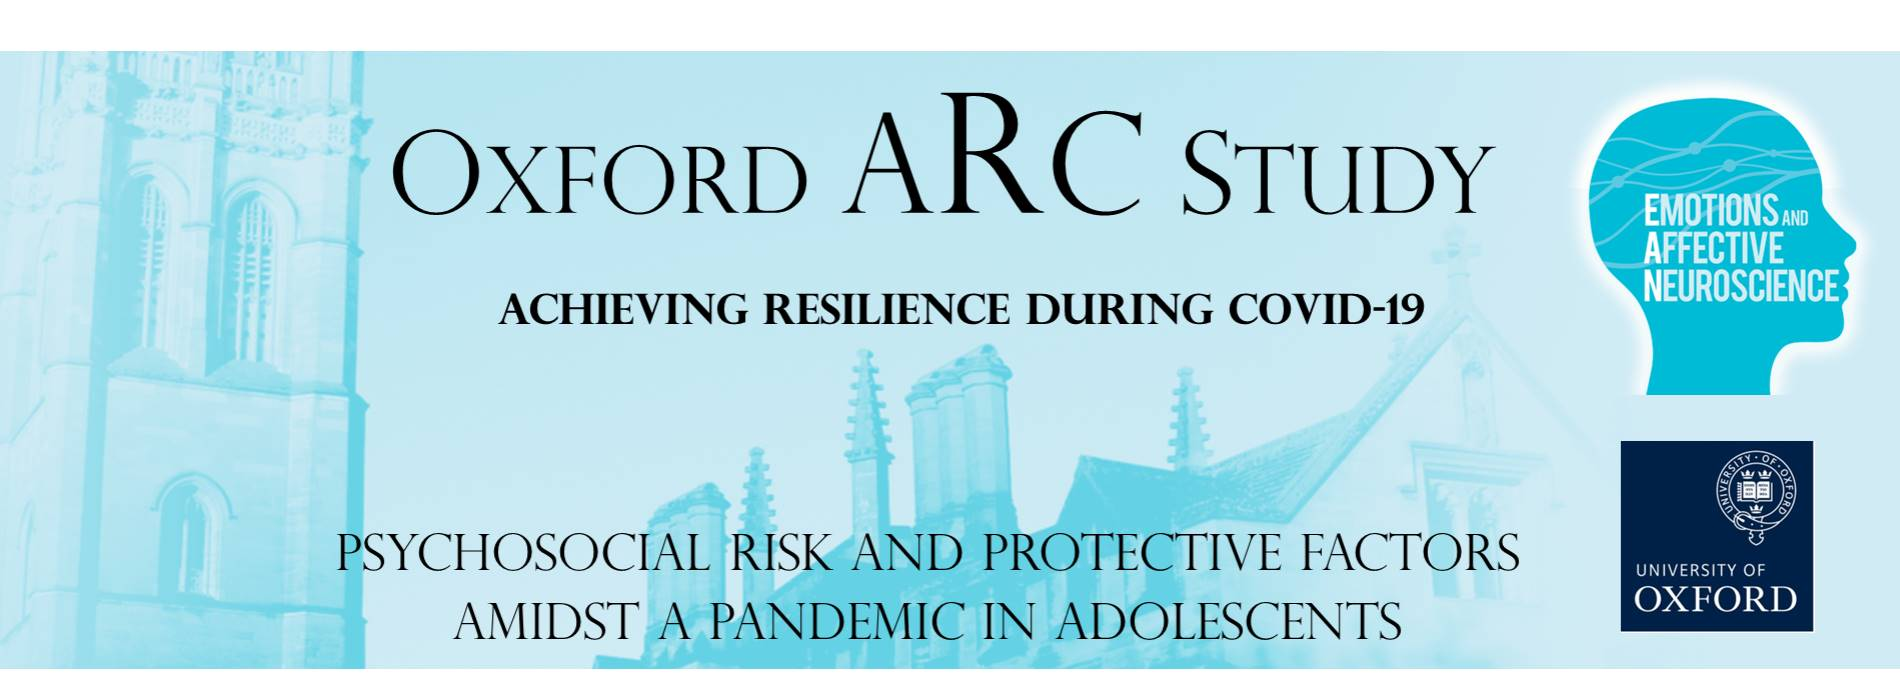 Oxford ARC Study (April 2020)